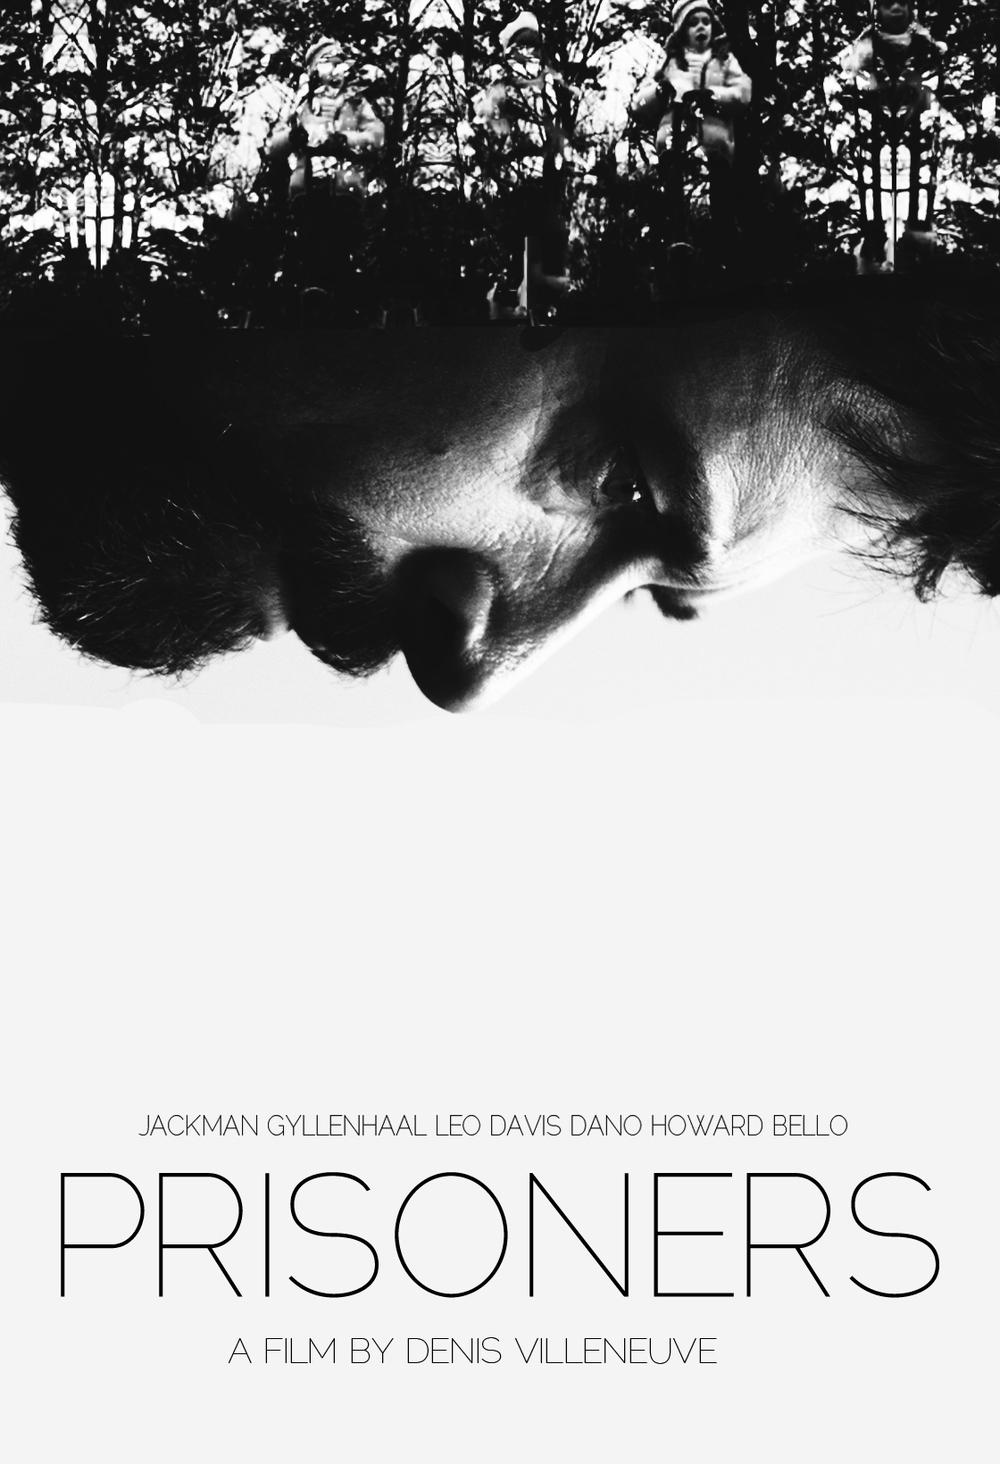 Hugh_Jackman_Prisoners.jpg